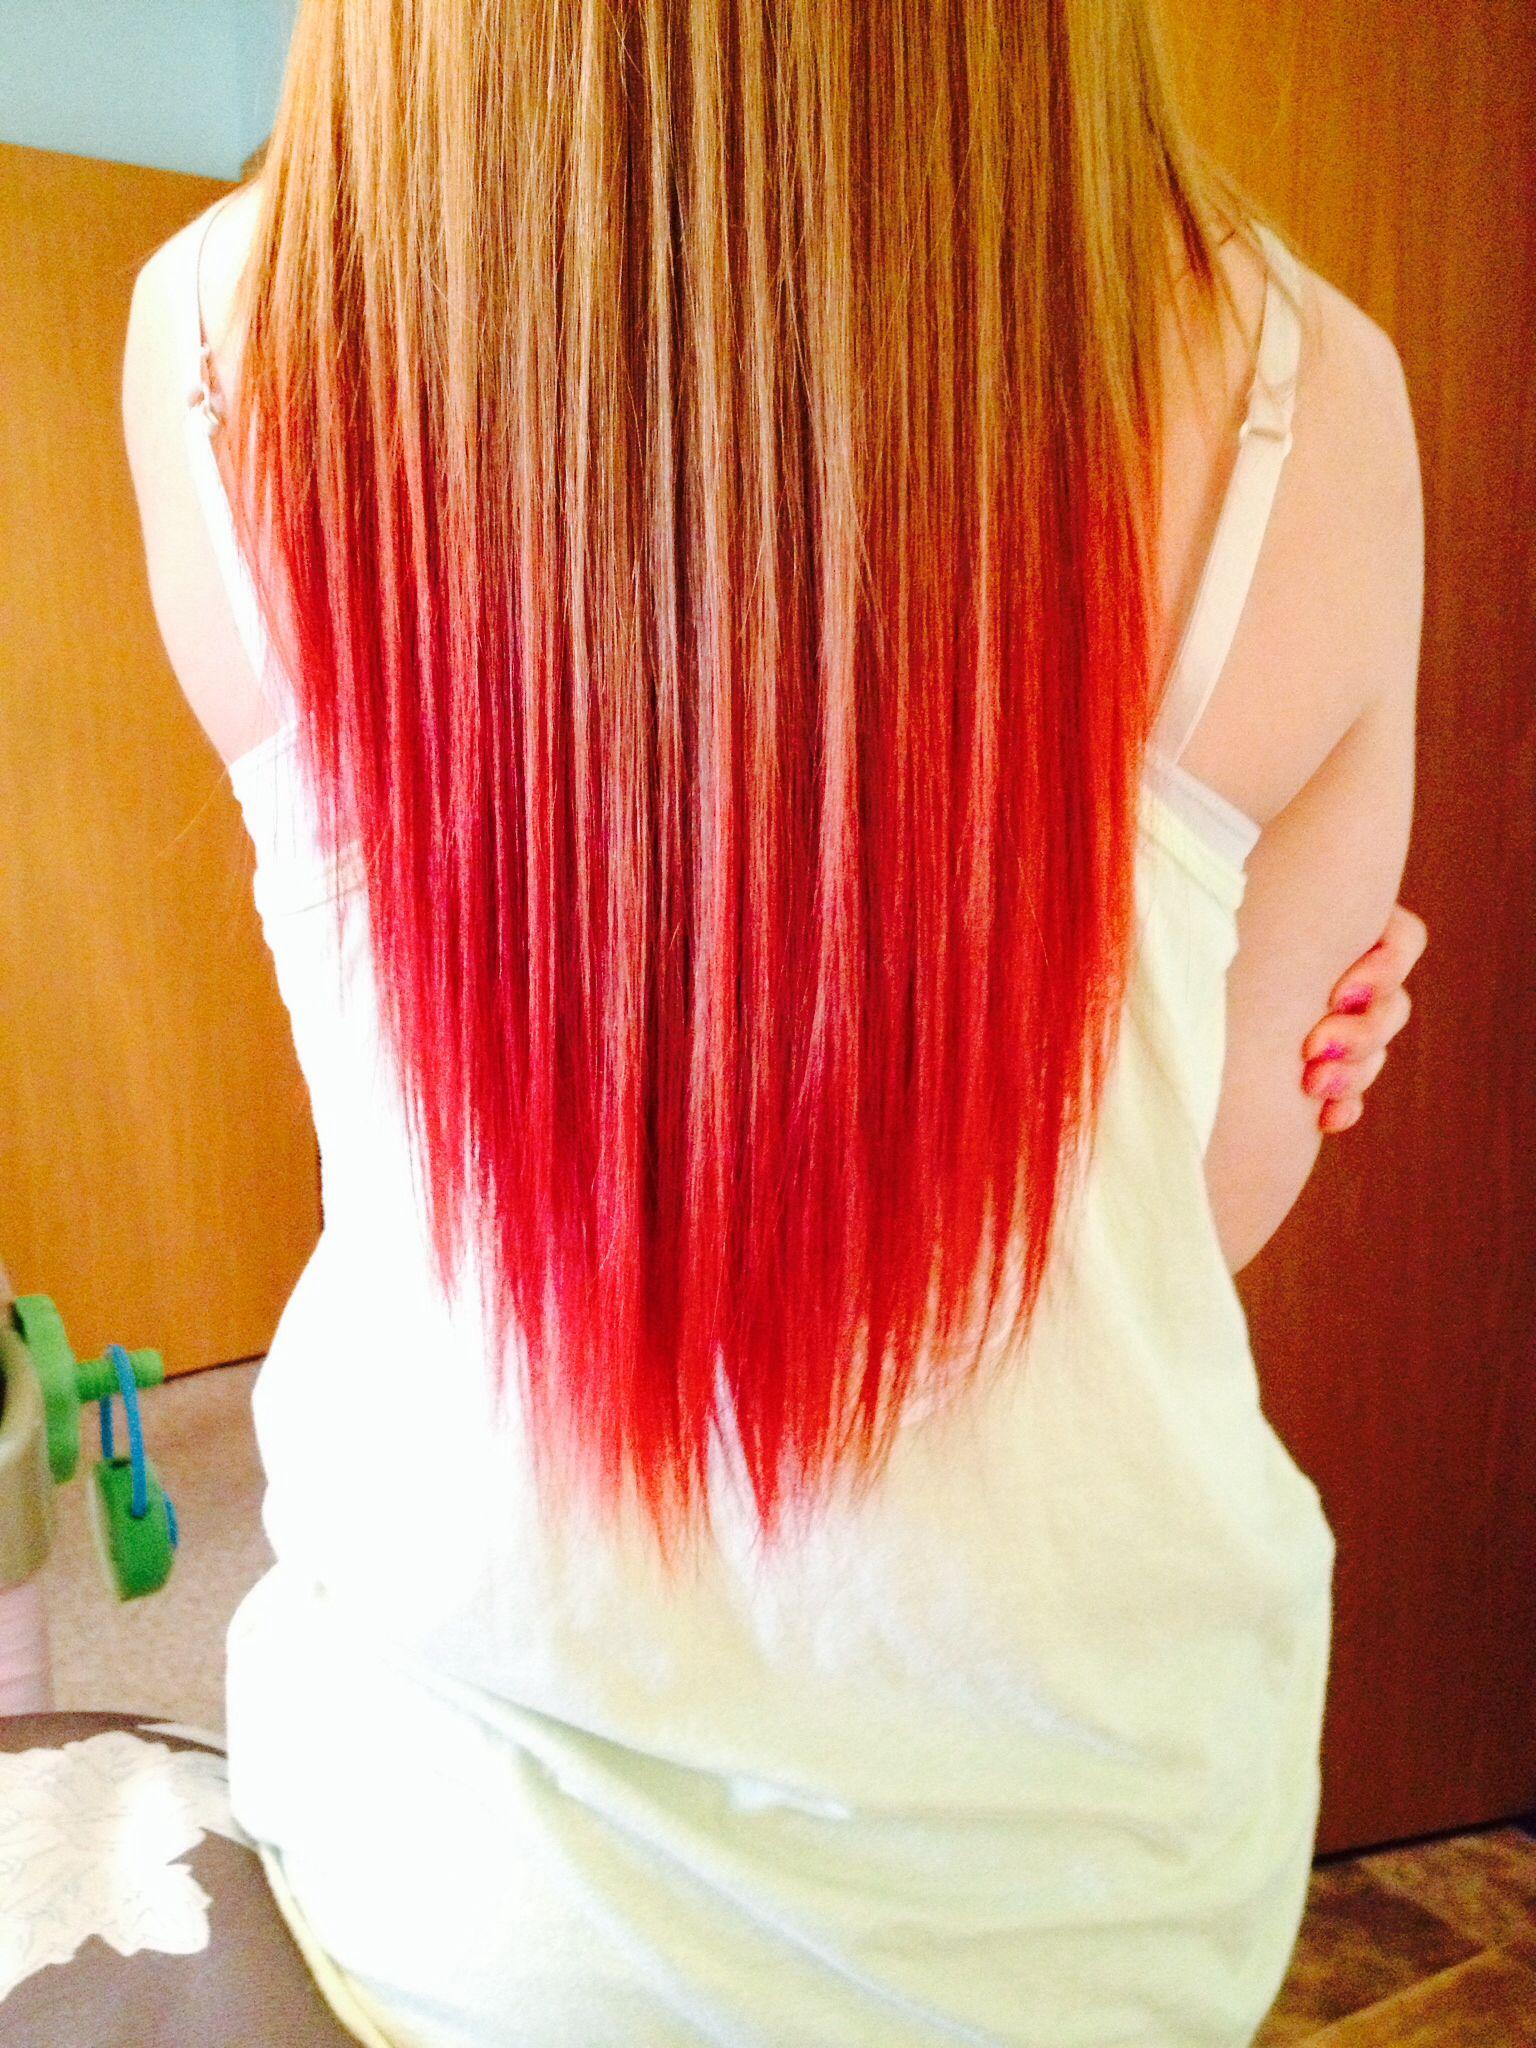 My Dip Dyed Hair Dip Dye Hair Dipped Hair Red Dip Dye Hair